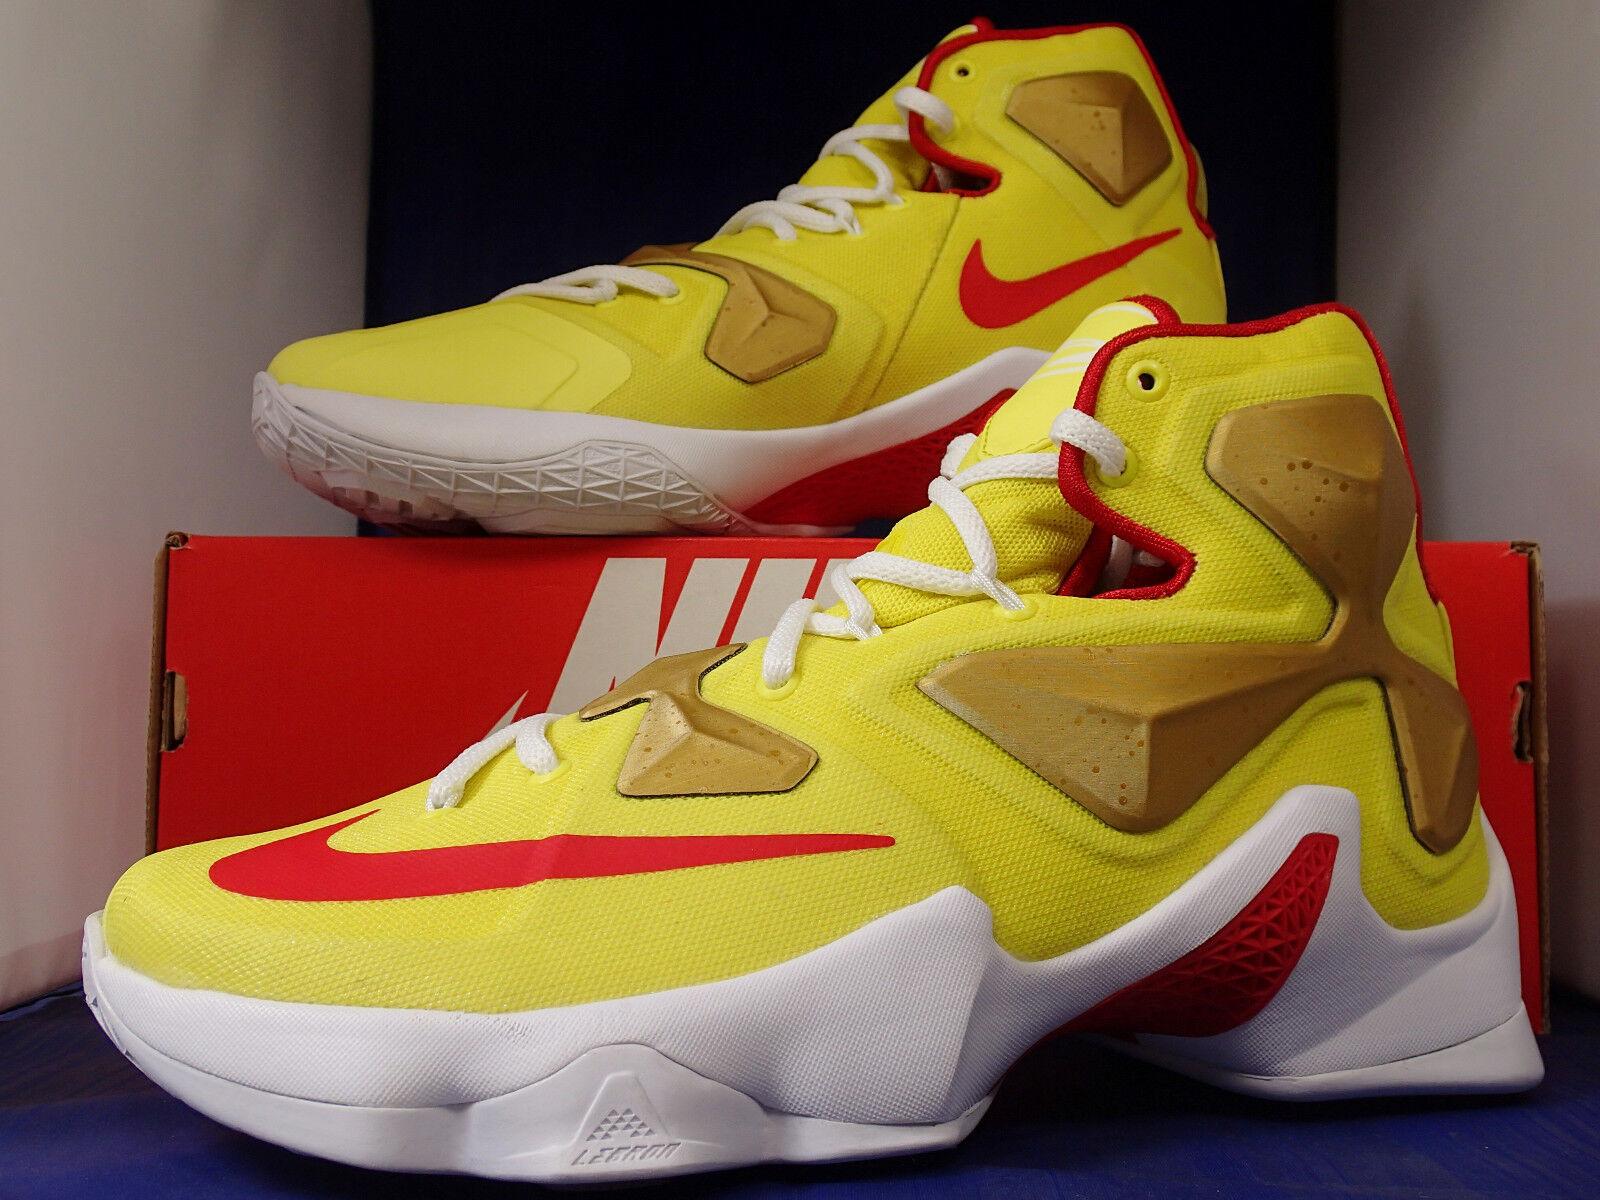 Nike Lebron XIII 13 Identifikation University Gold Rote Sz Us Damen 7 / Damen Us 8.5 6d9e05